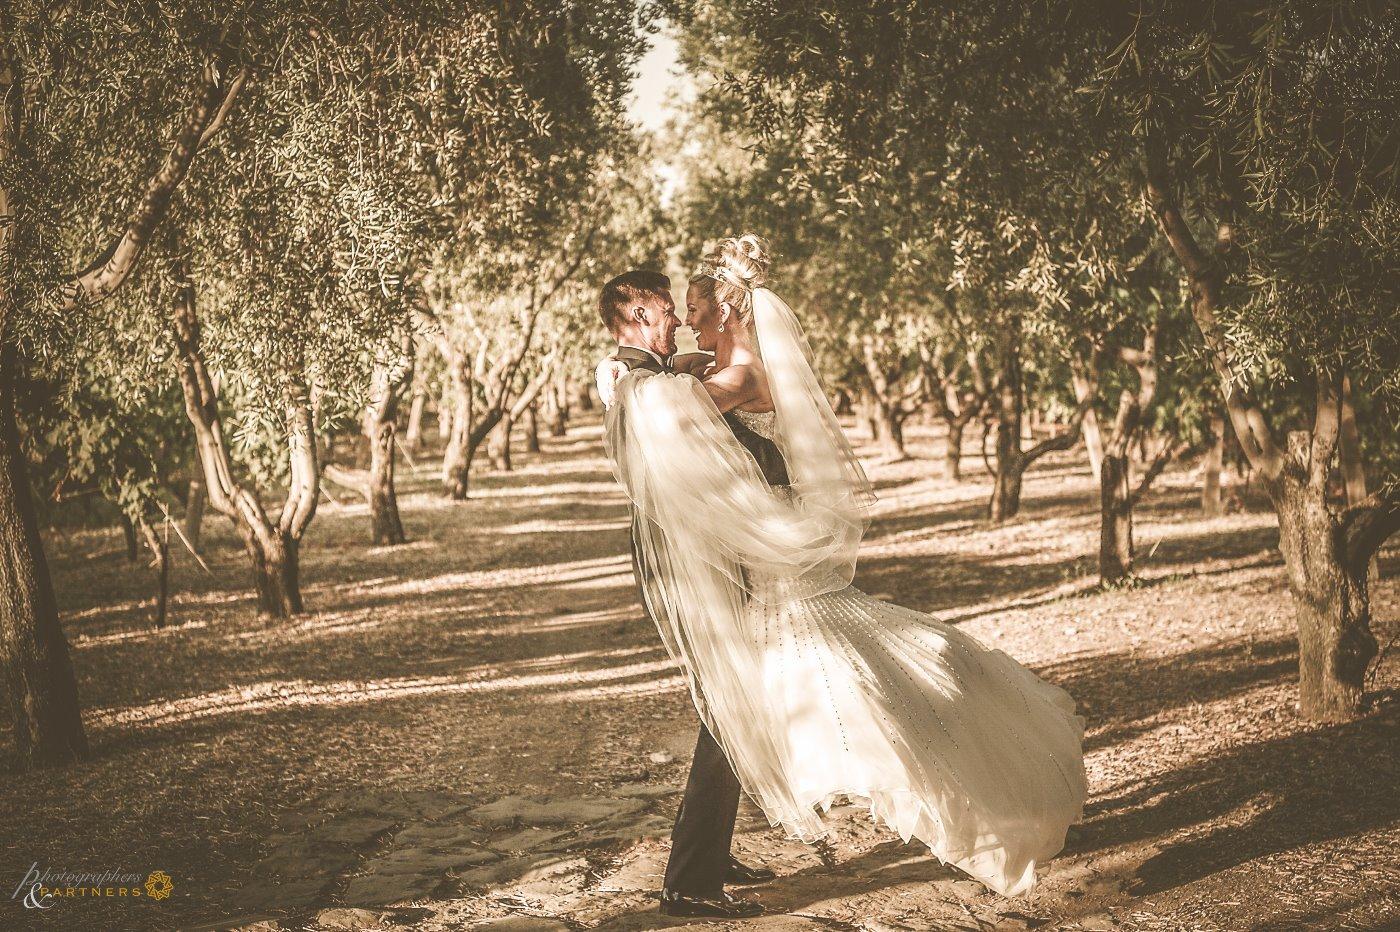 photo_weddings_frascati_14.jpg